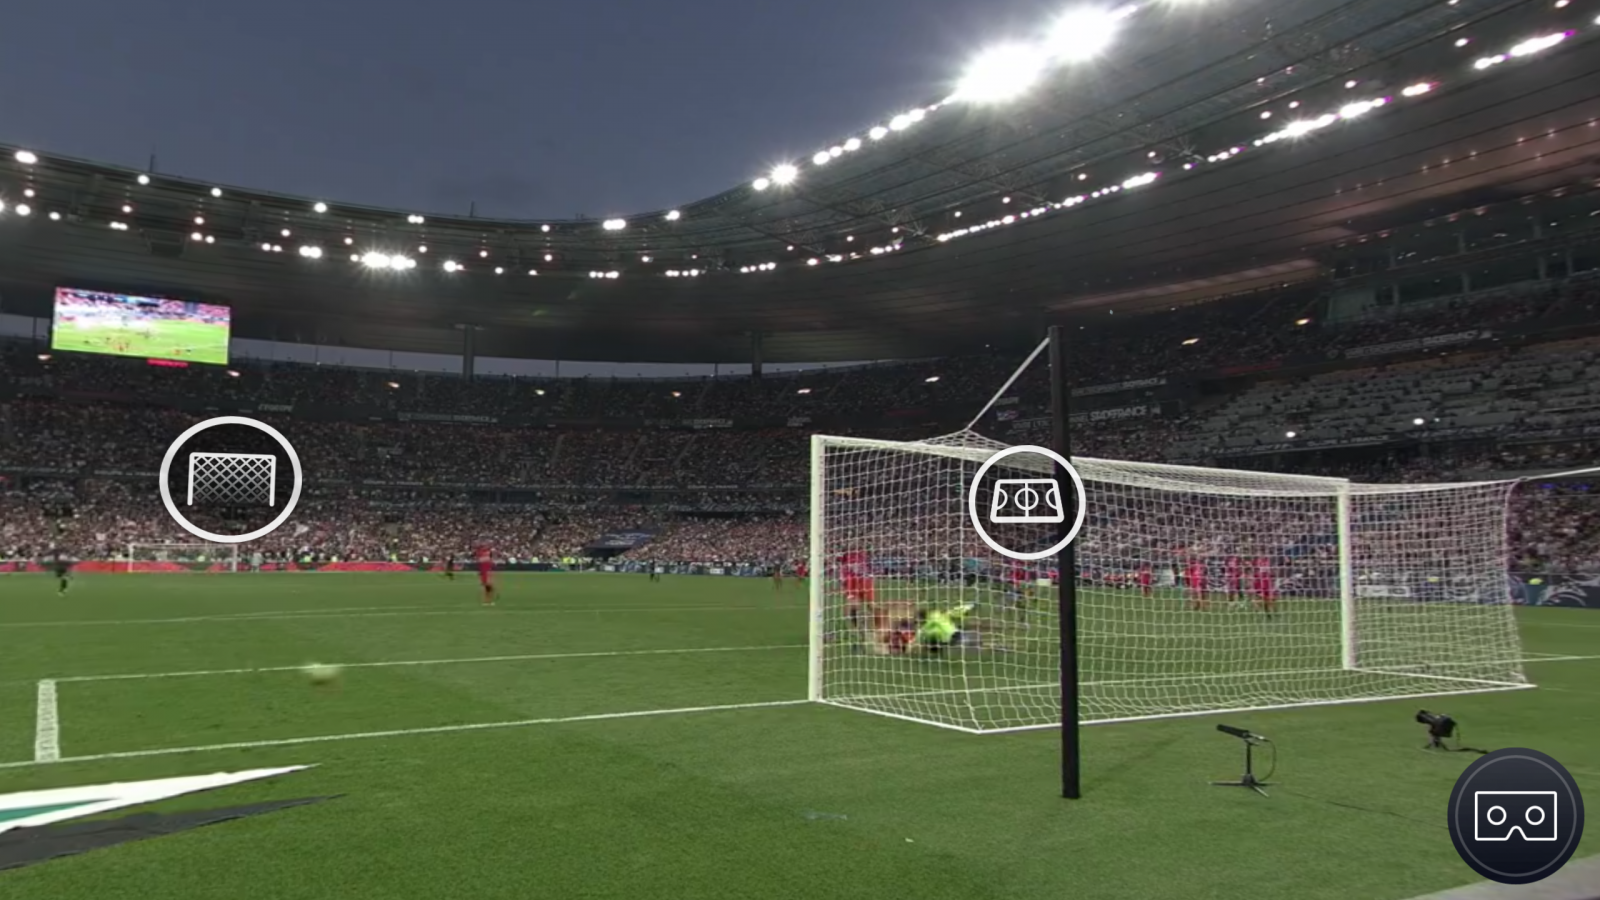 France tv sport 360 app with LiveLike